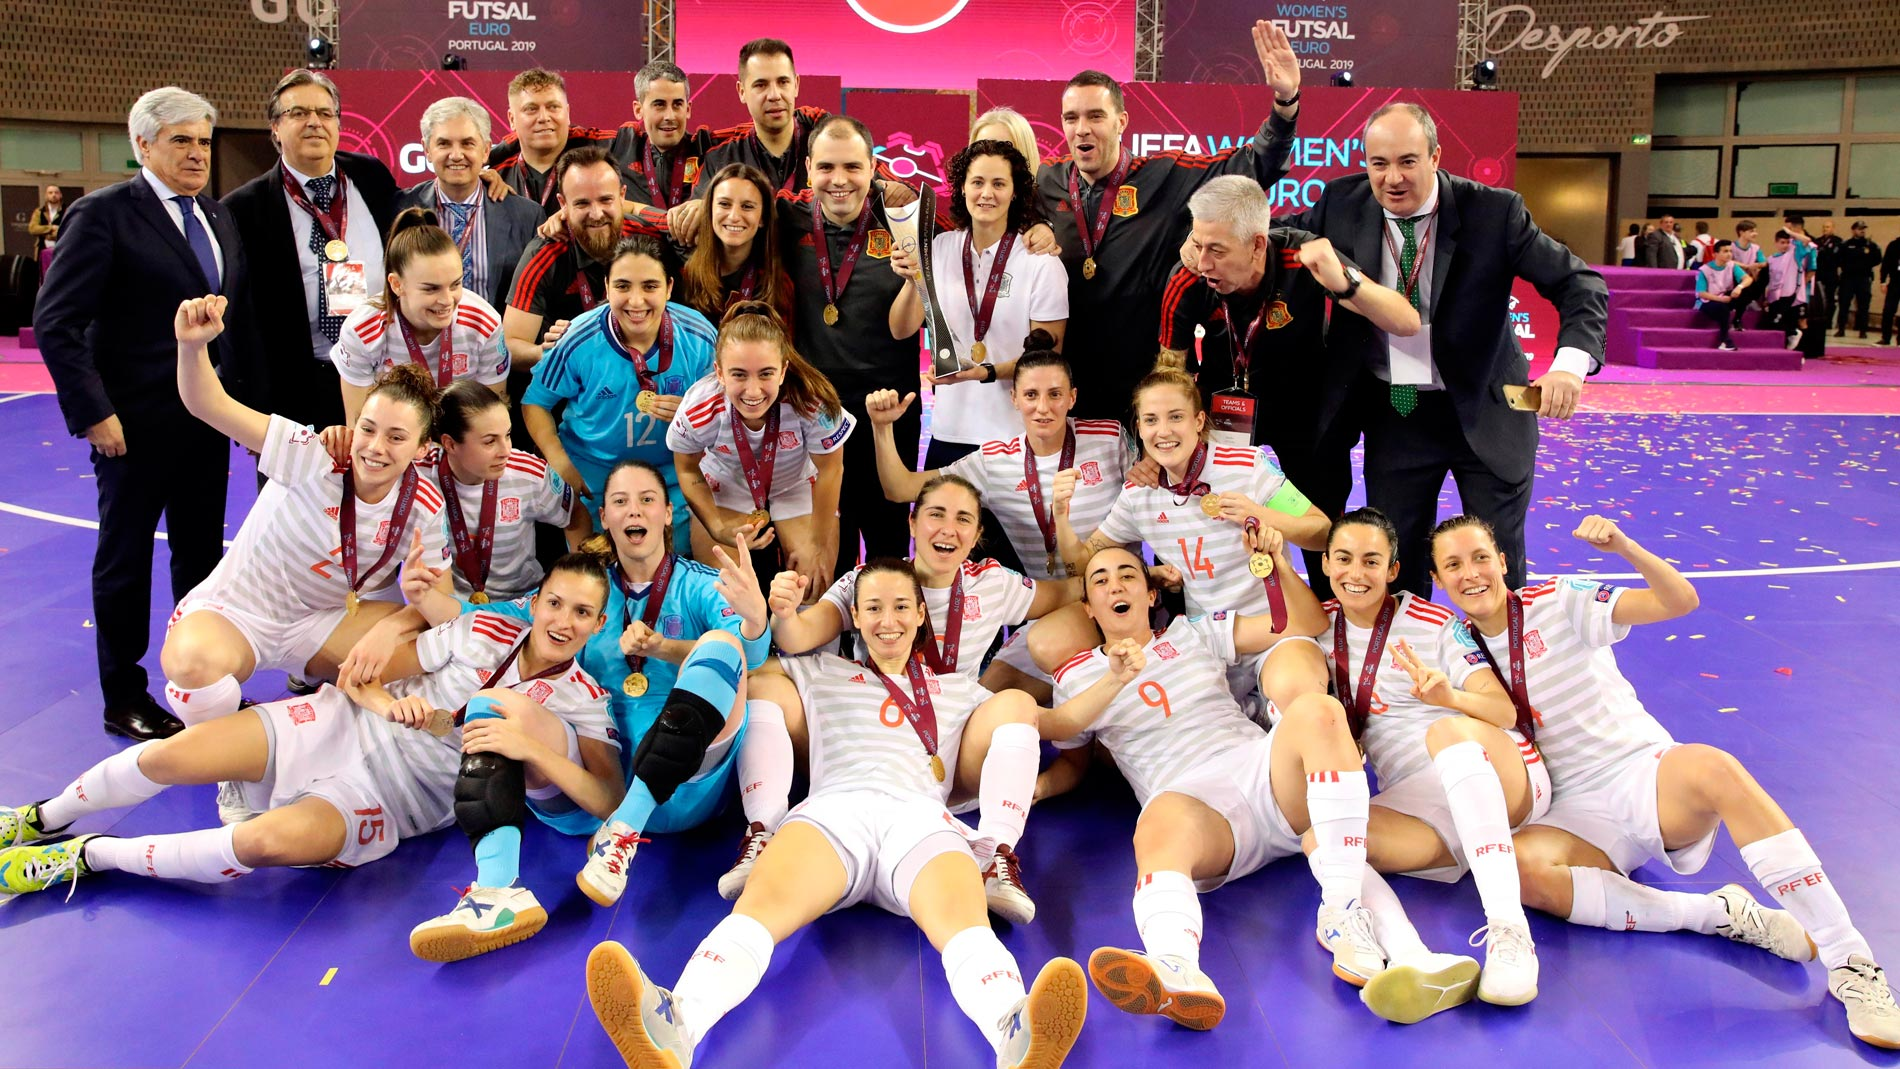 España, primera campeona de Europa de fútbol sala femenino